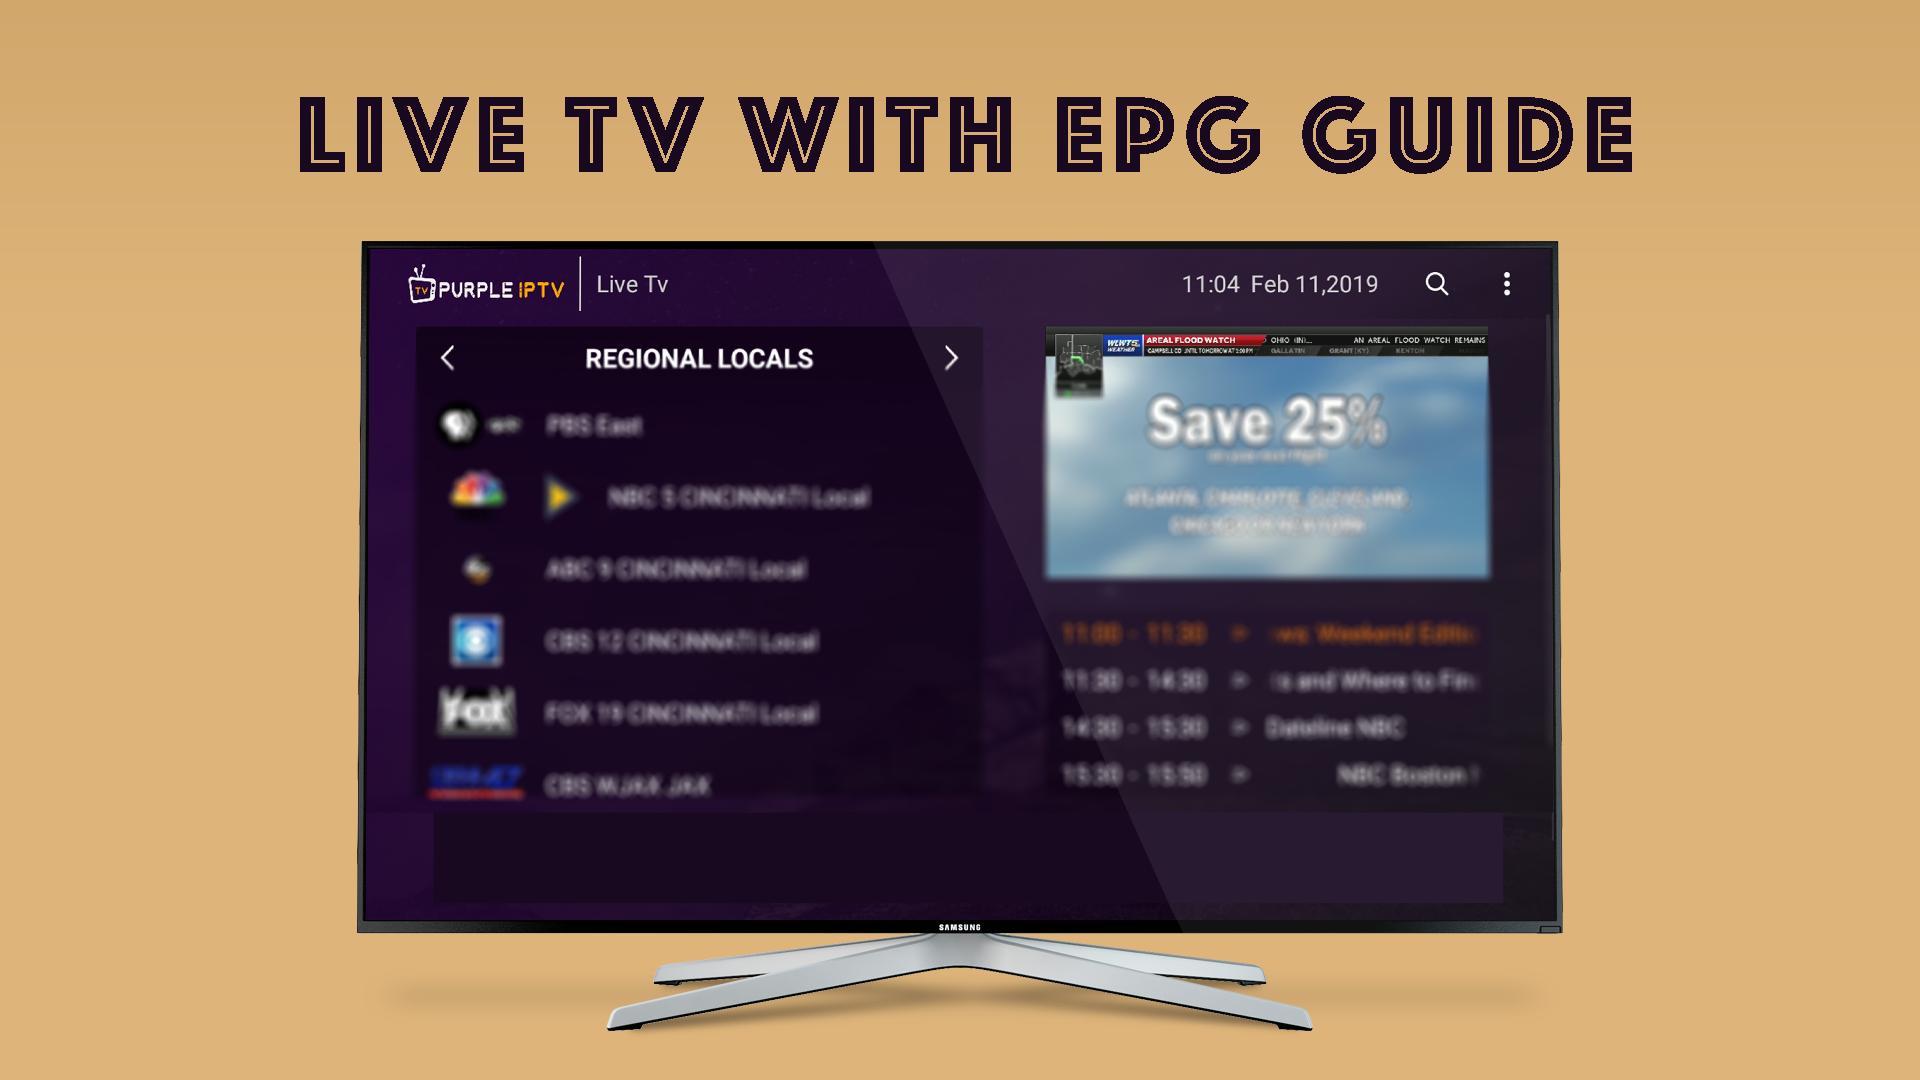 Iptv Tv Guide Apk